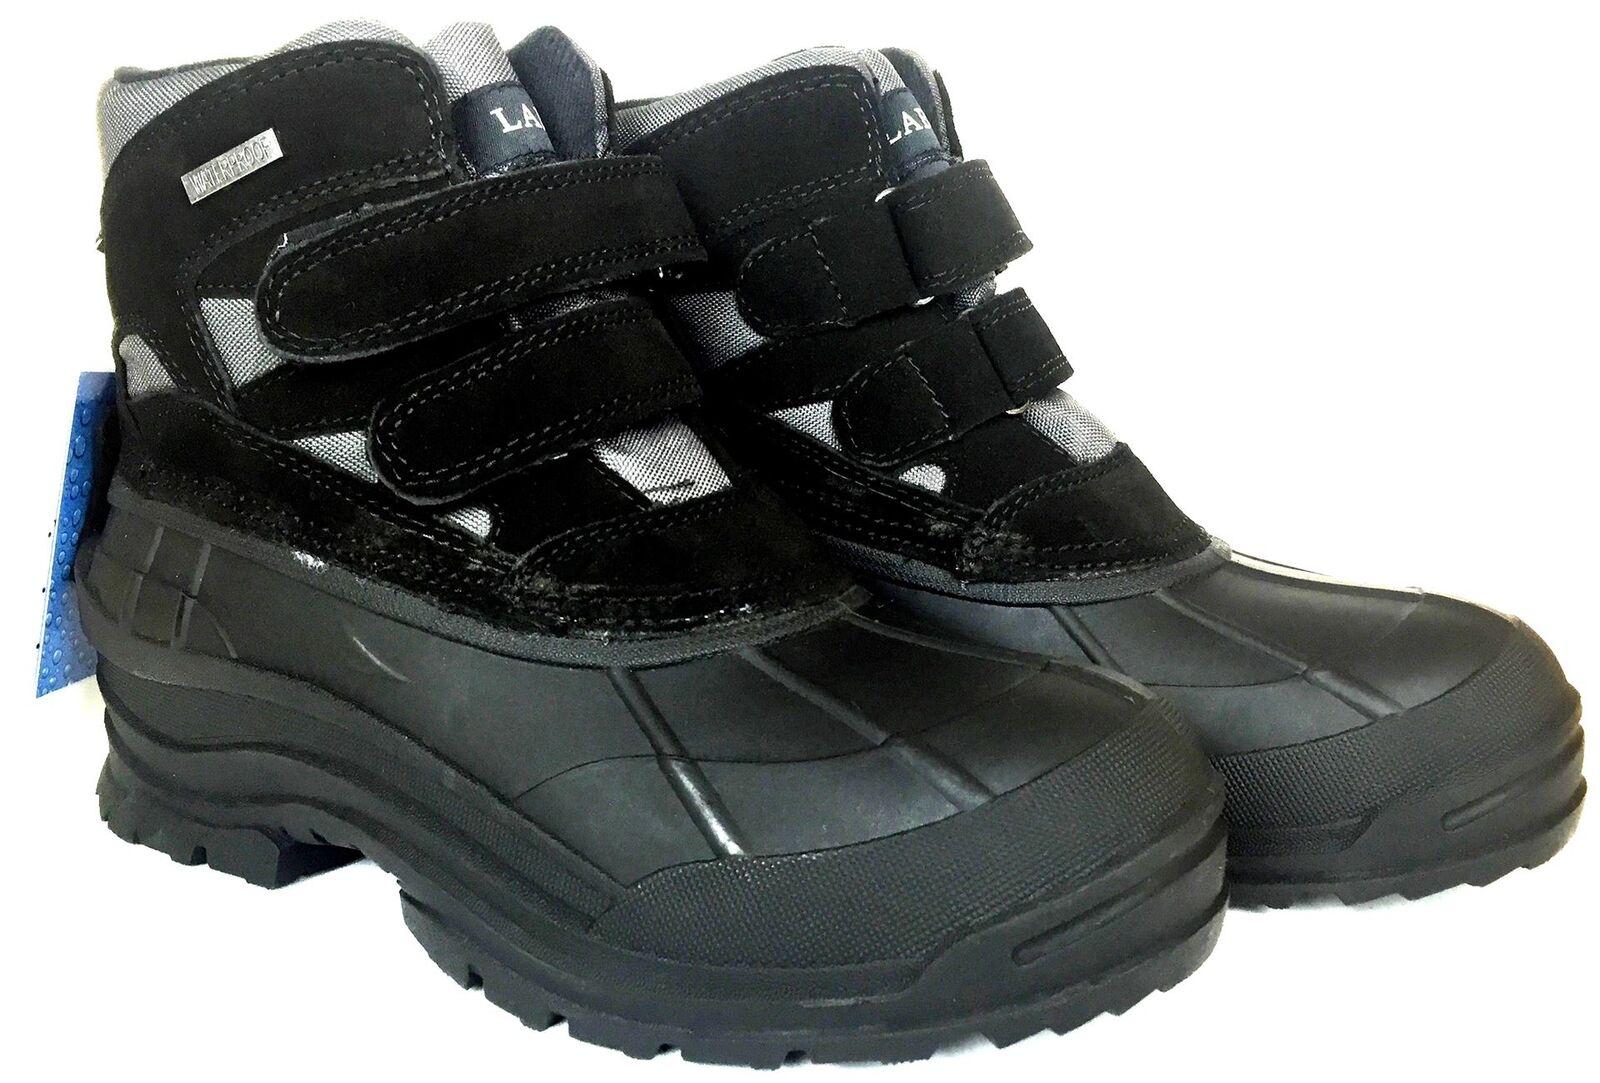 LABO Men's Leather Winter Snow Boots